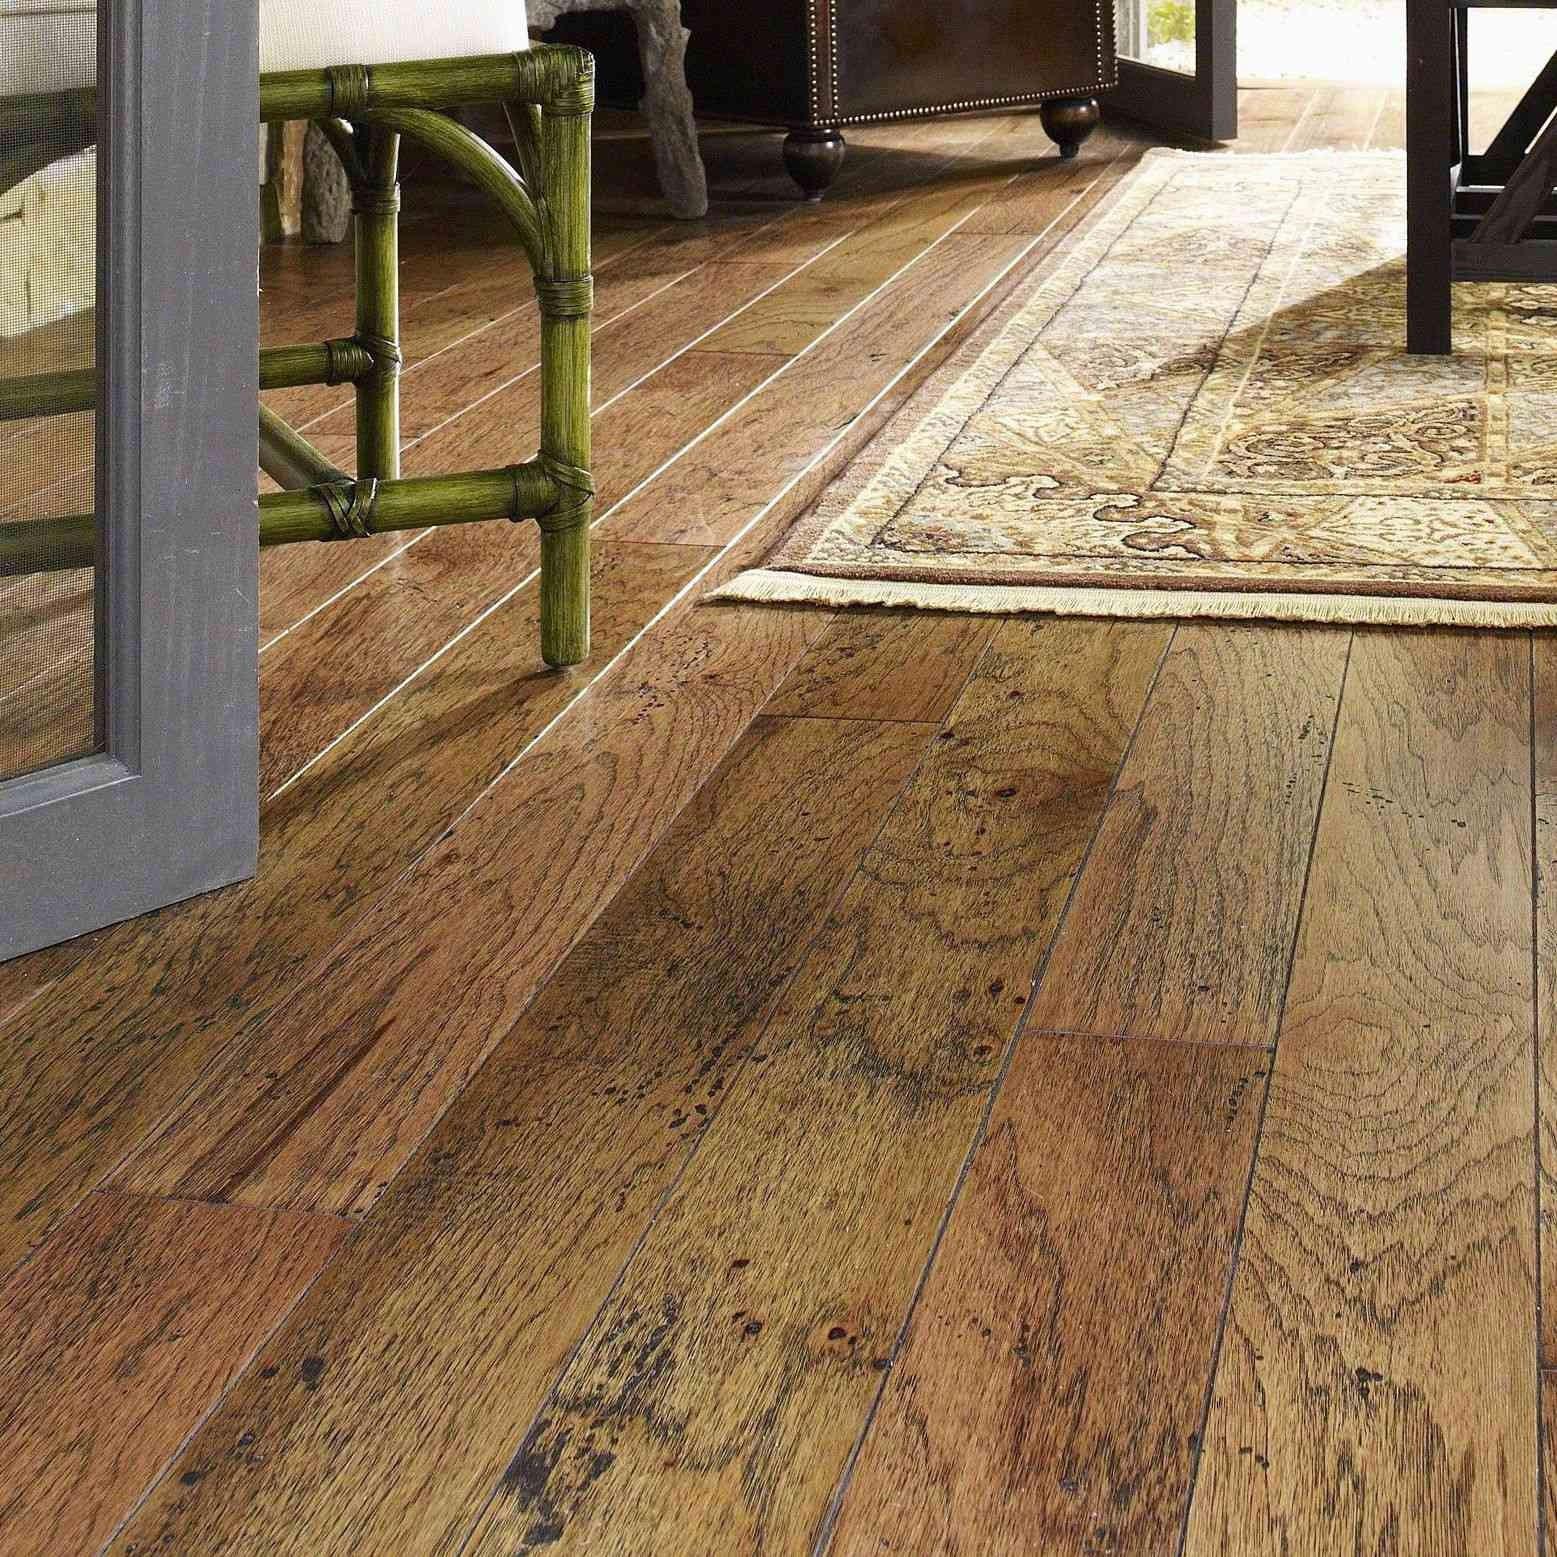 dark hardwood floors pinterest of 15 elegant how much is hardwood flooring pics dizpos com in how much is hardwood flooring best of picture 27 of 50 hardwood floor designs new best